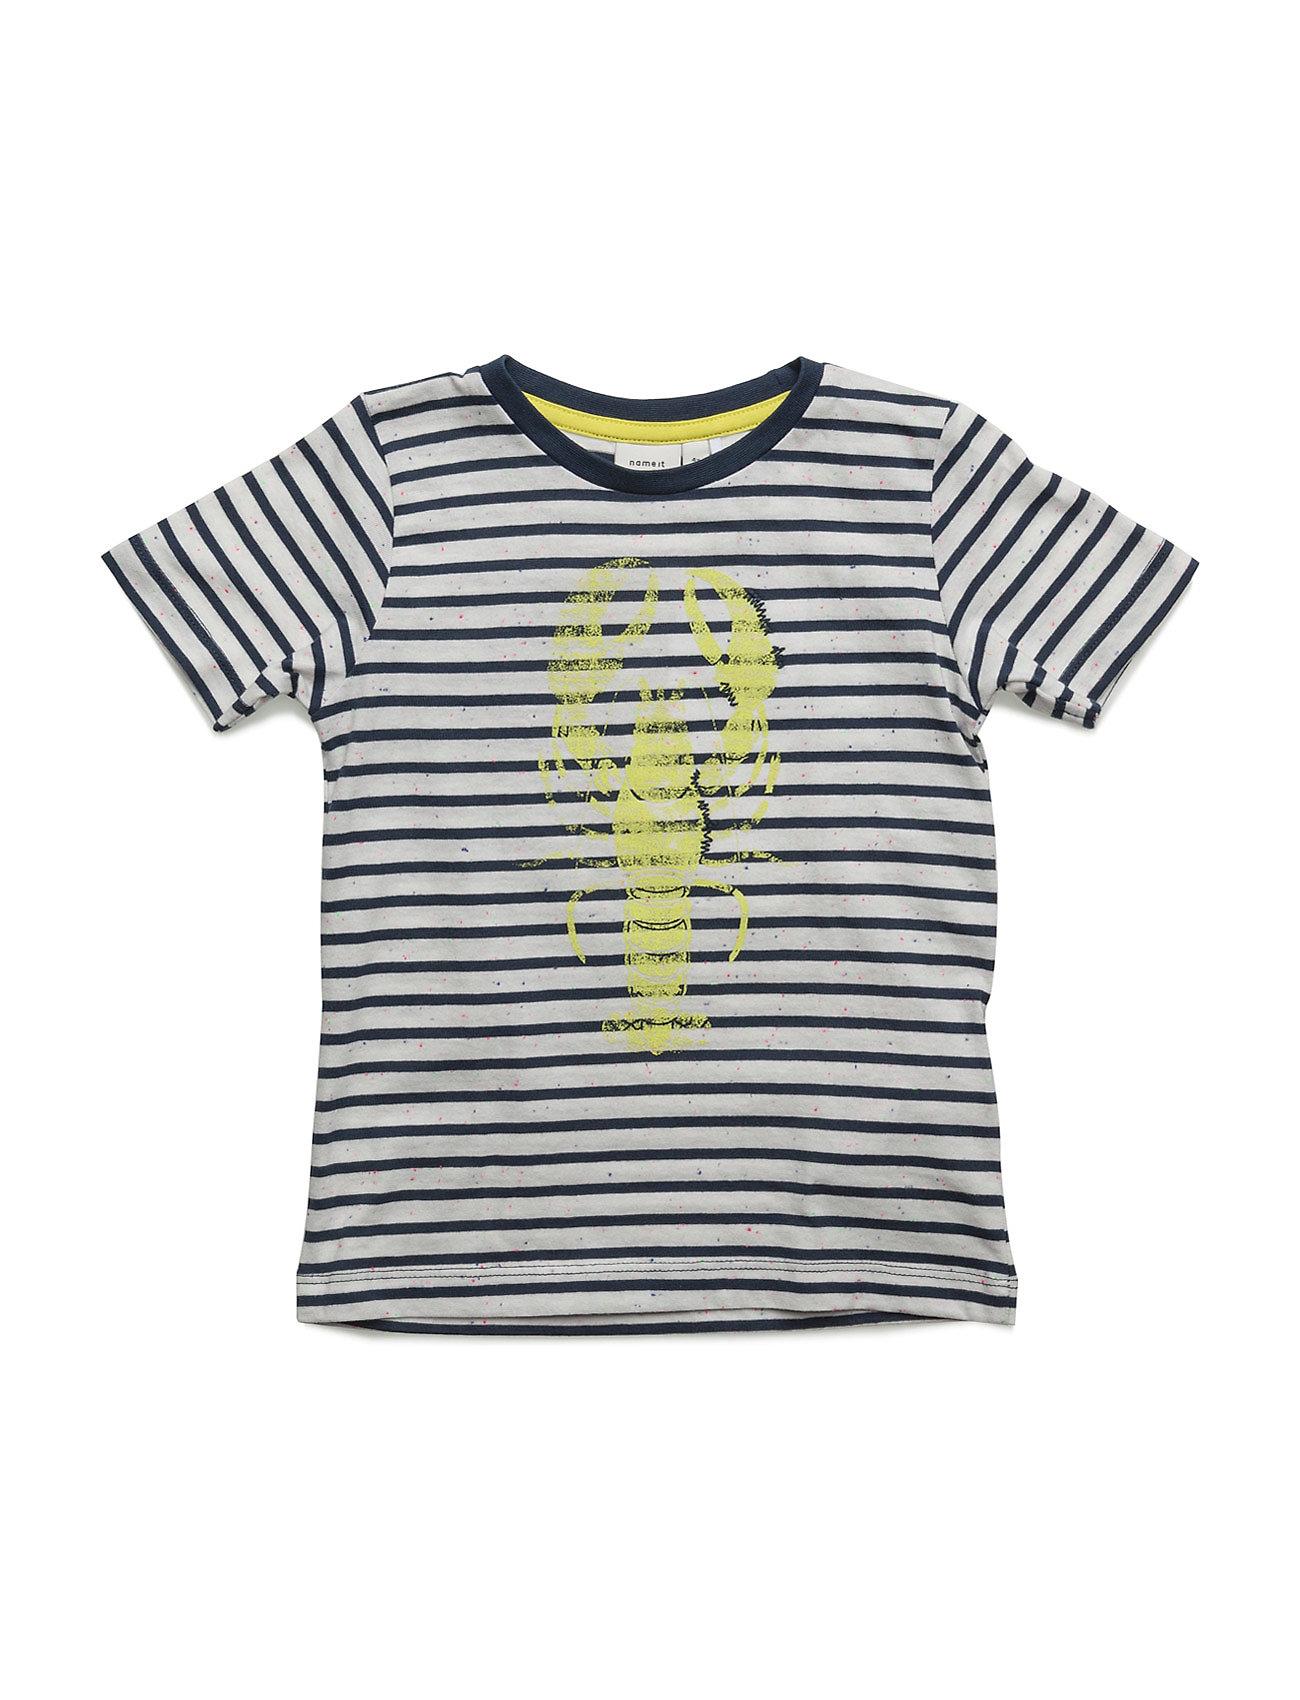 Nitfunder Ss Top Mz name it T-shirts til Drenge i Dress Blues